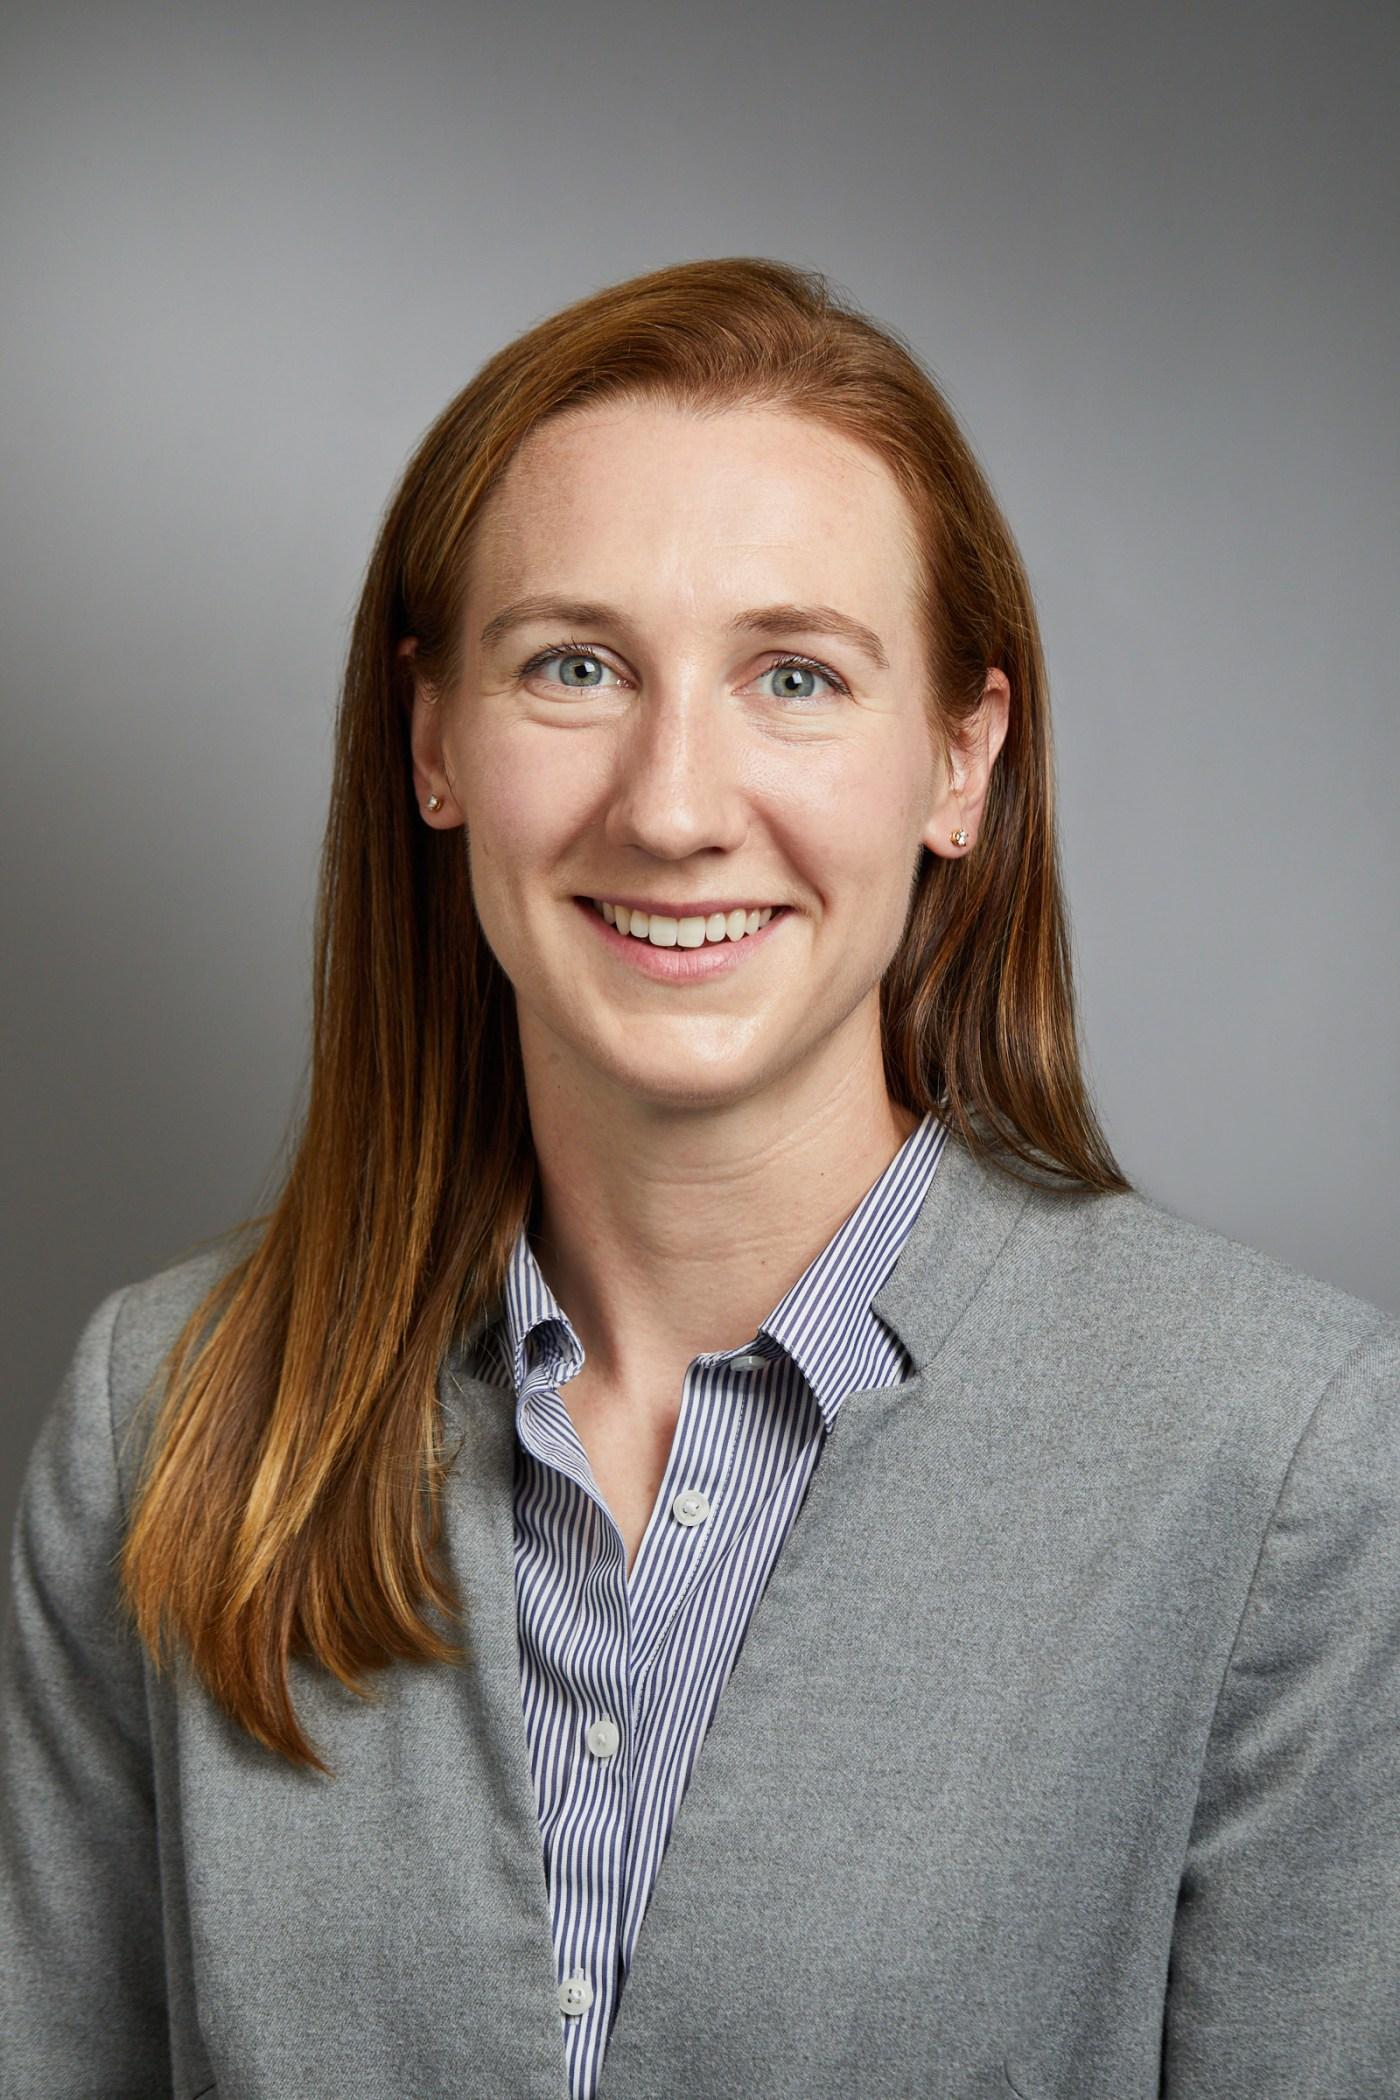 Samantha Smith, MD